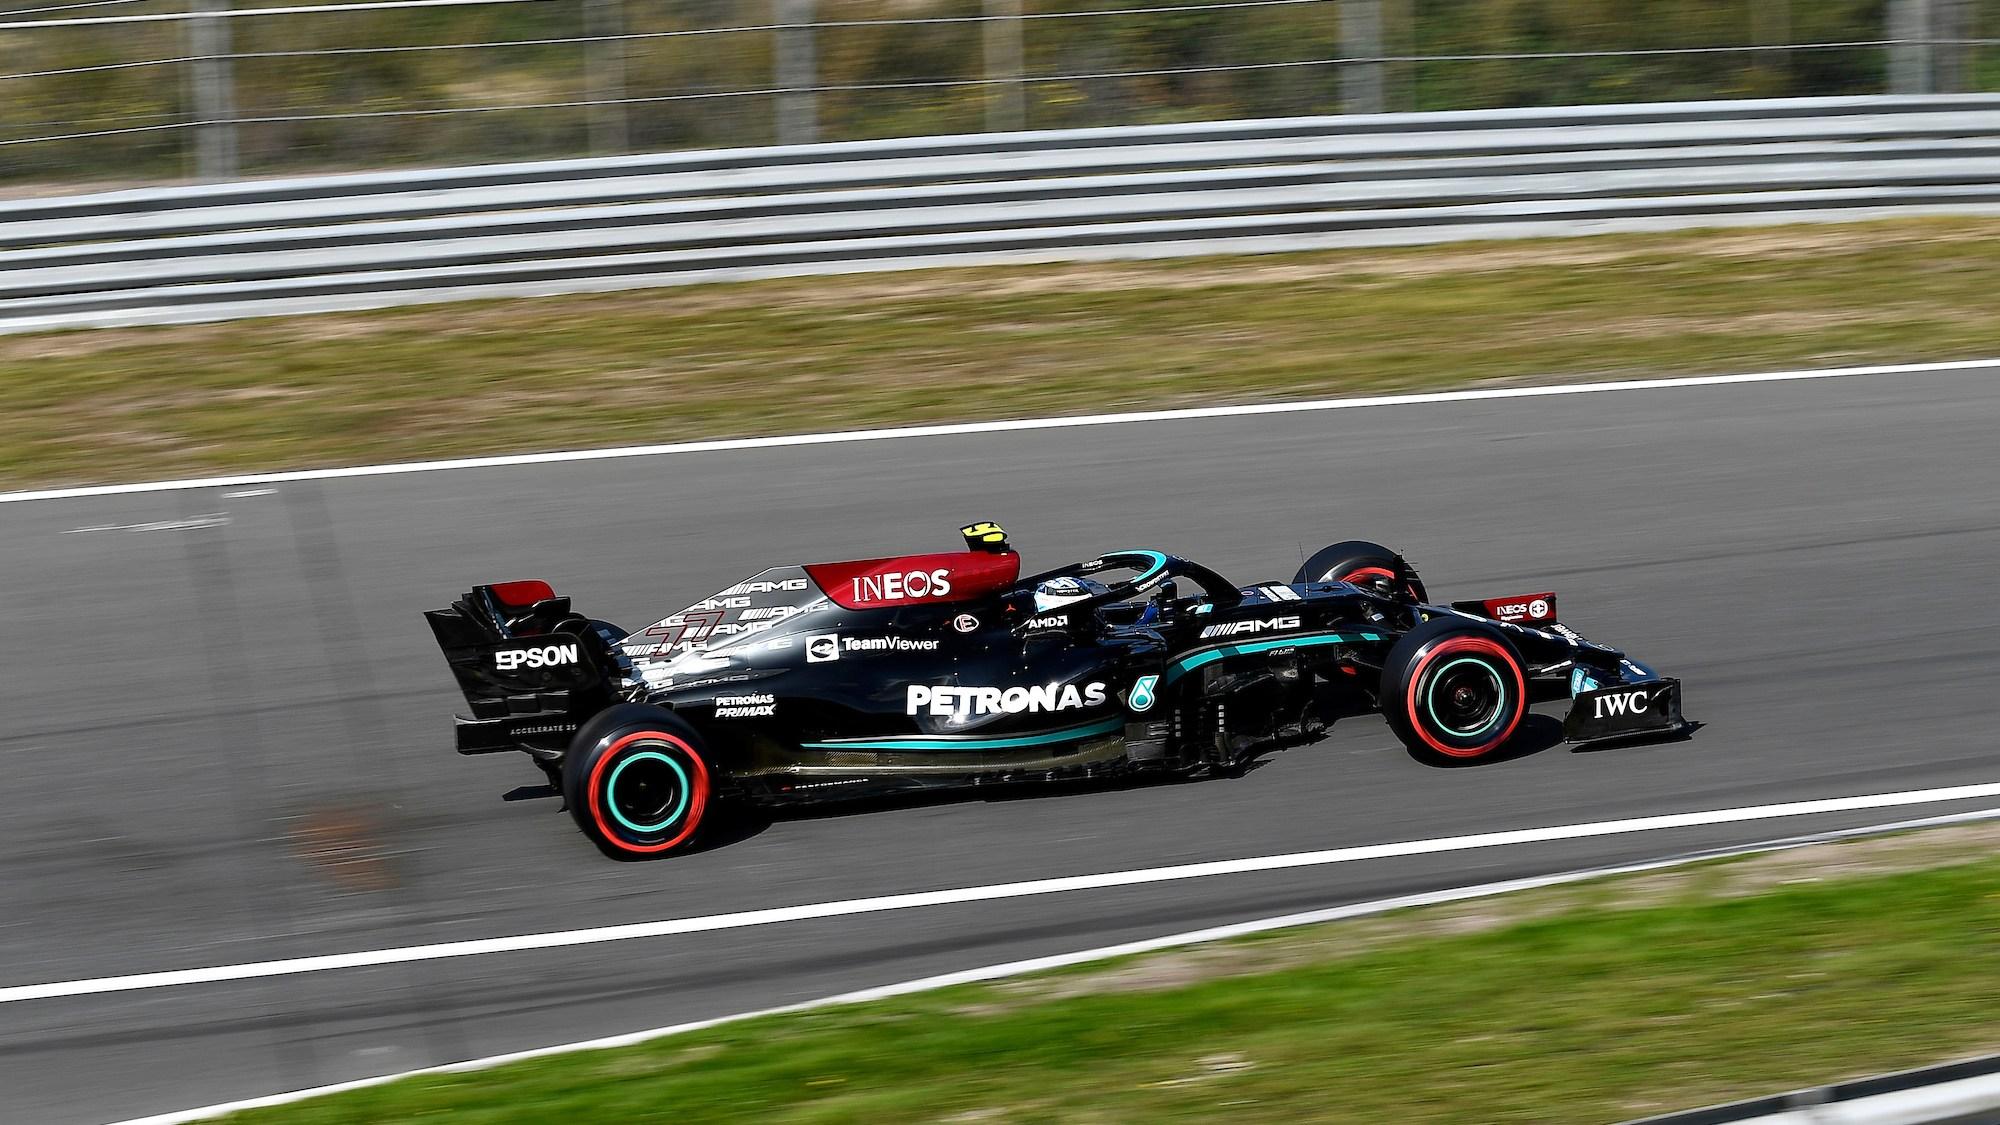 Valtteri Bottas, 2021 Dutch GP